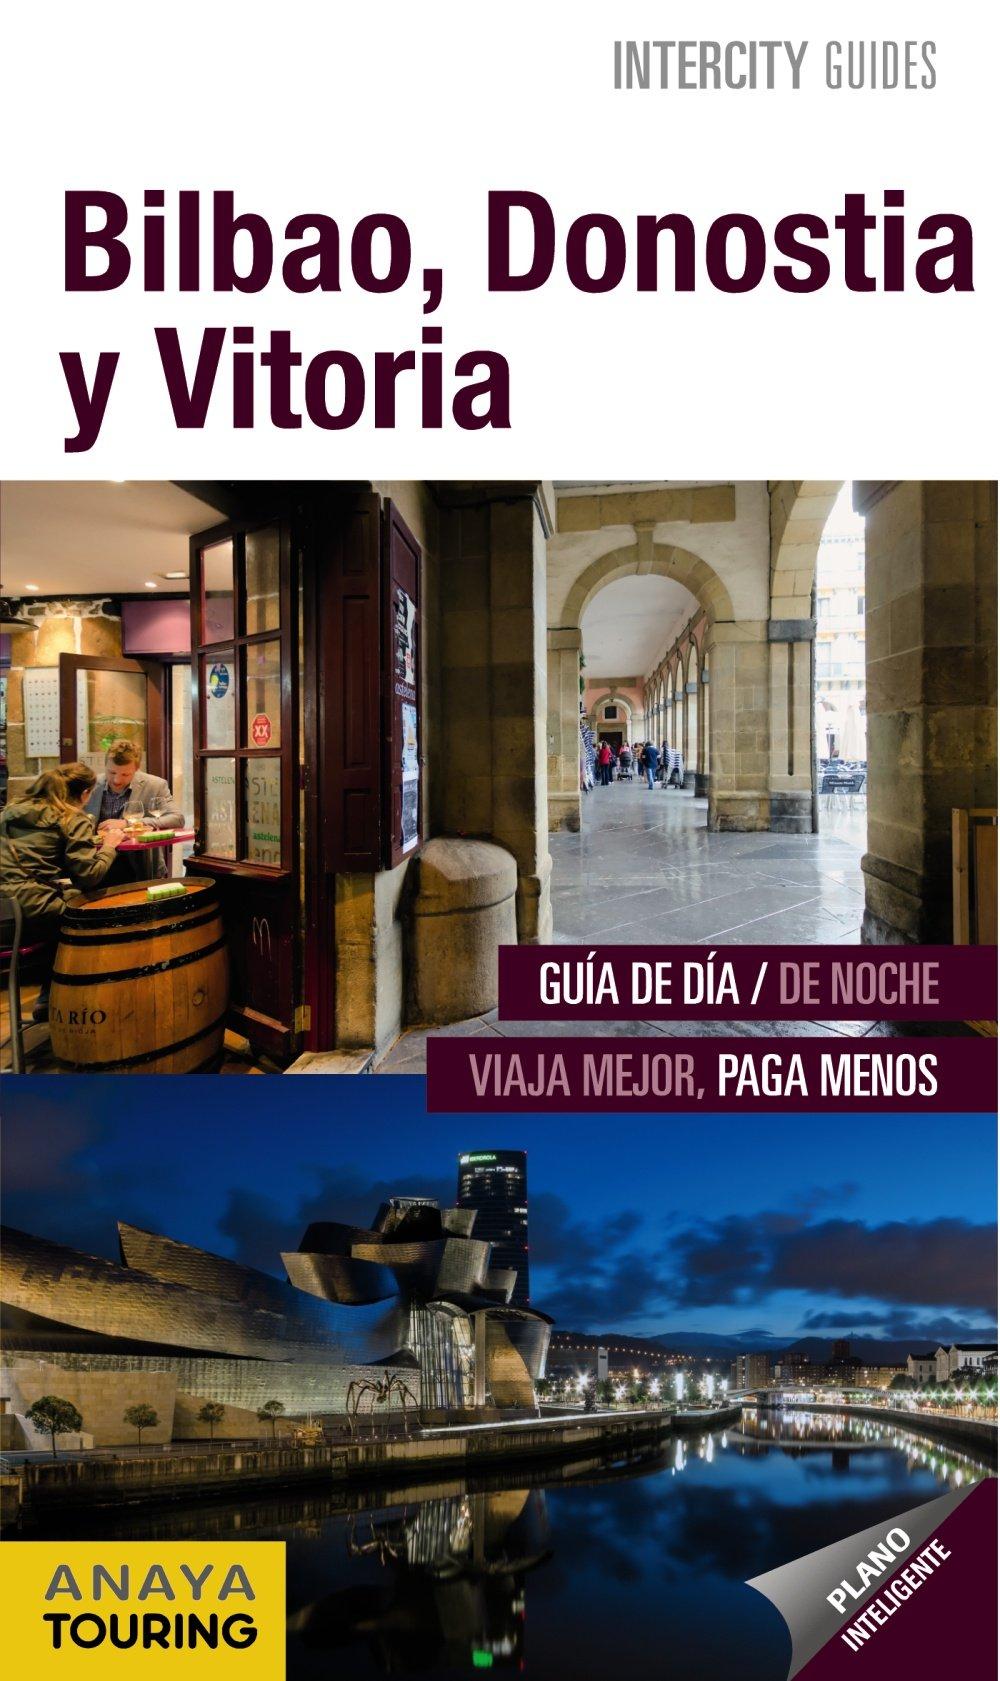 Bilbao, Donostia, Vitoria (INTERCITY GUIDES - España): Amazon.es: Anaya Touring, Gómez Gómez, José Ignacio: Libros